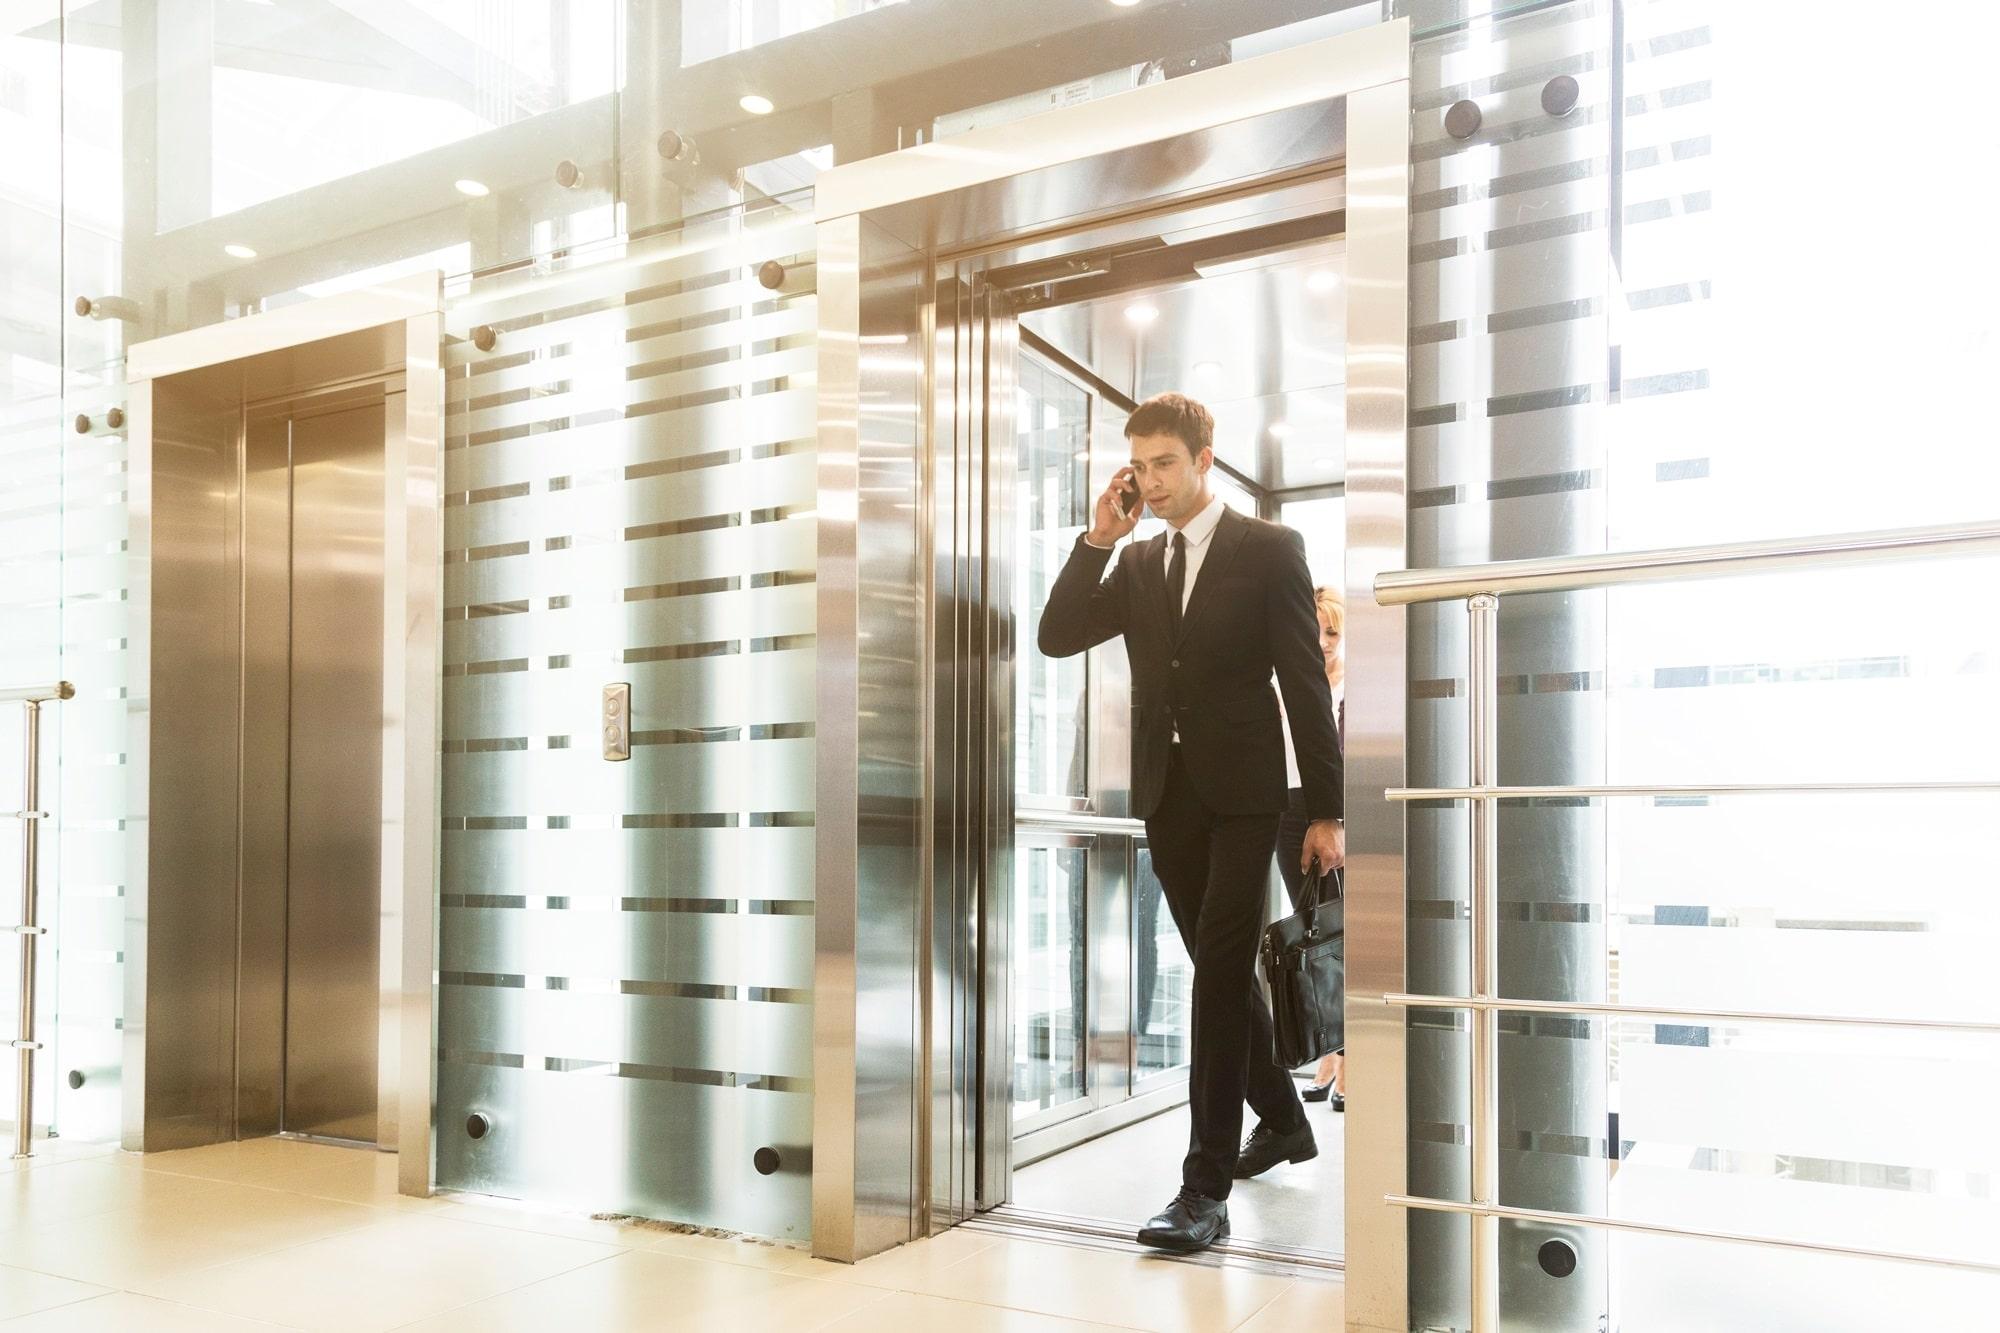 Asansör,Ankara,Asansör,Asansör Firmaları,Ankara Asansör Firmaları,Anıl Asansör,Niğde Asansör Firmaları,Asansör Arızaları,Akıllı Asansörler,Akıllı Asansör,Bilgisayar,Hologram,Max,Algoritma,Arıza